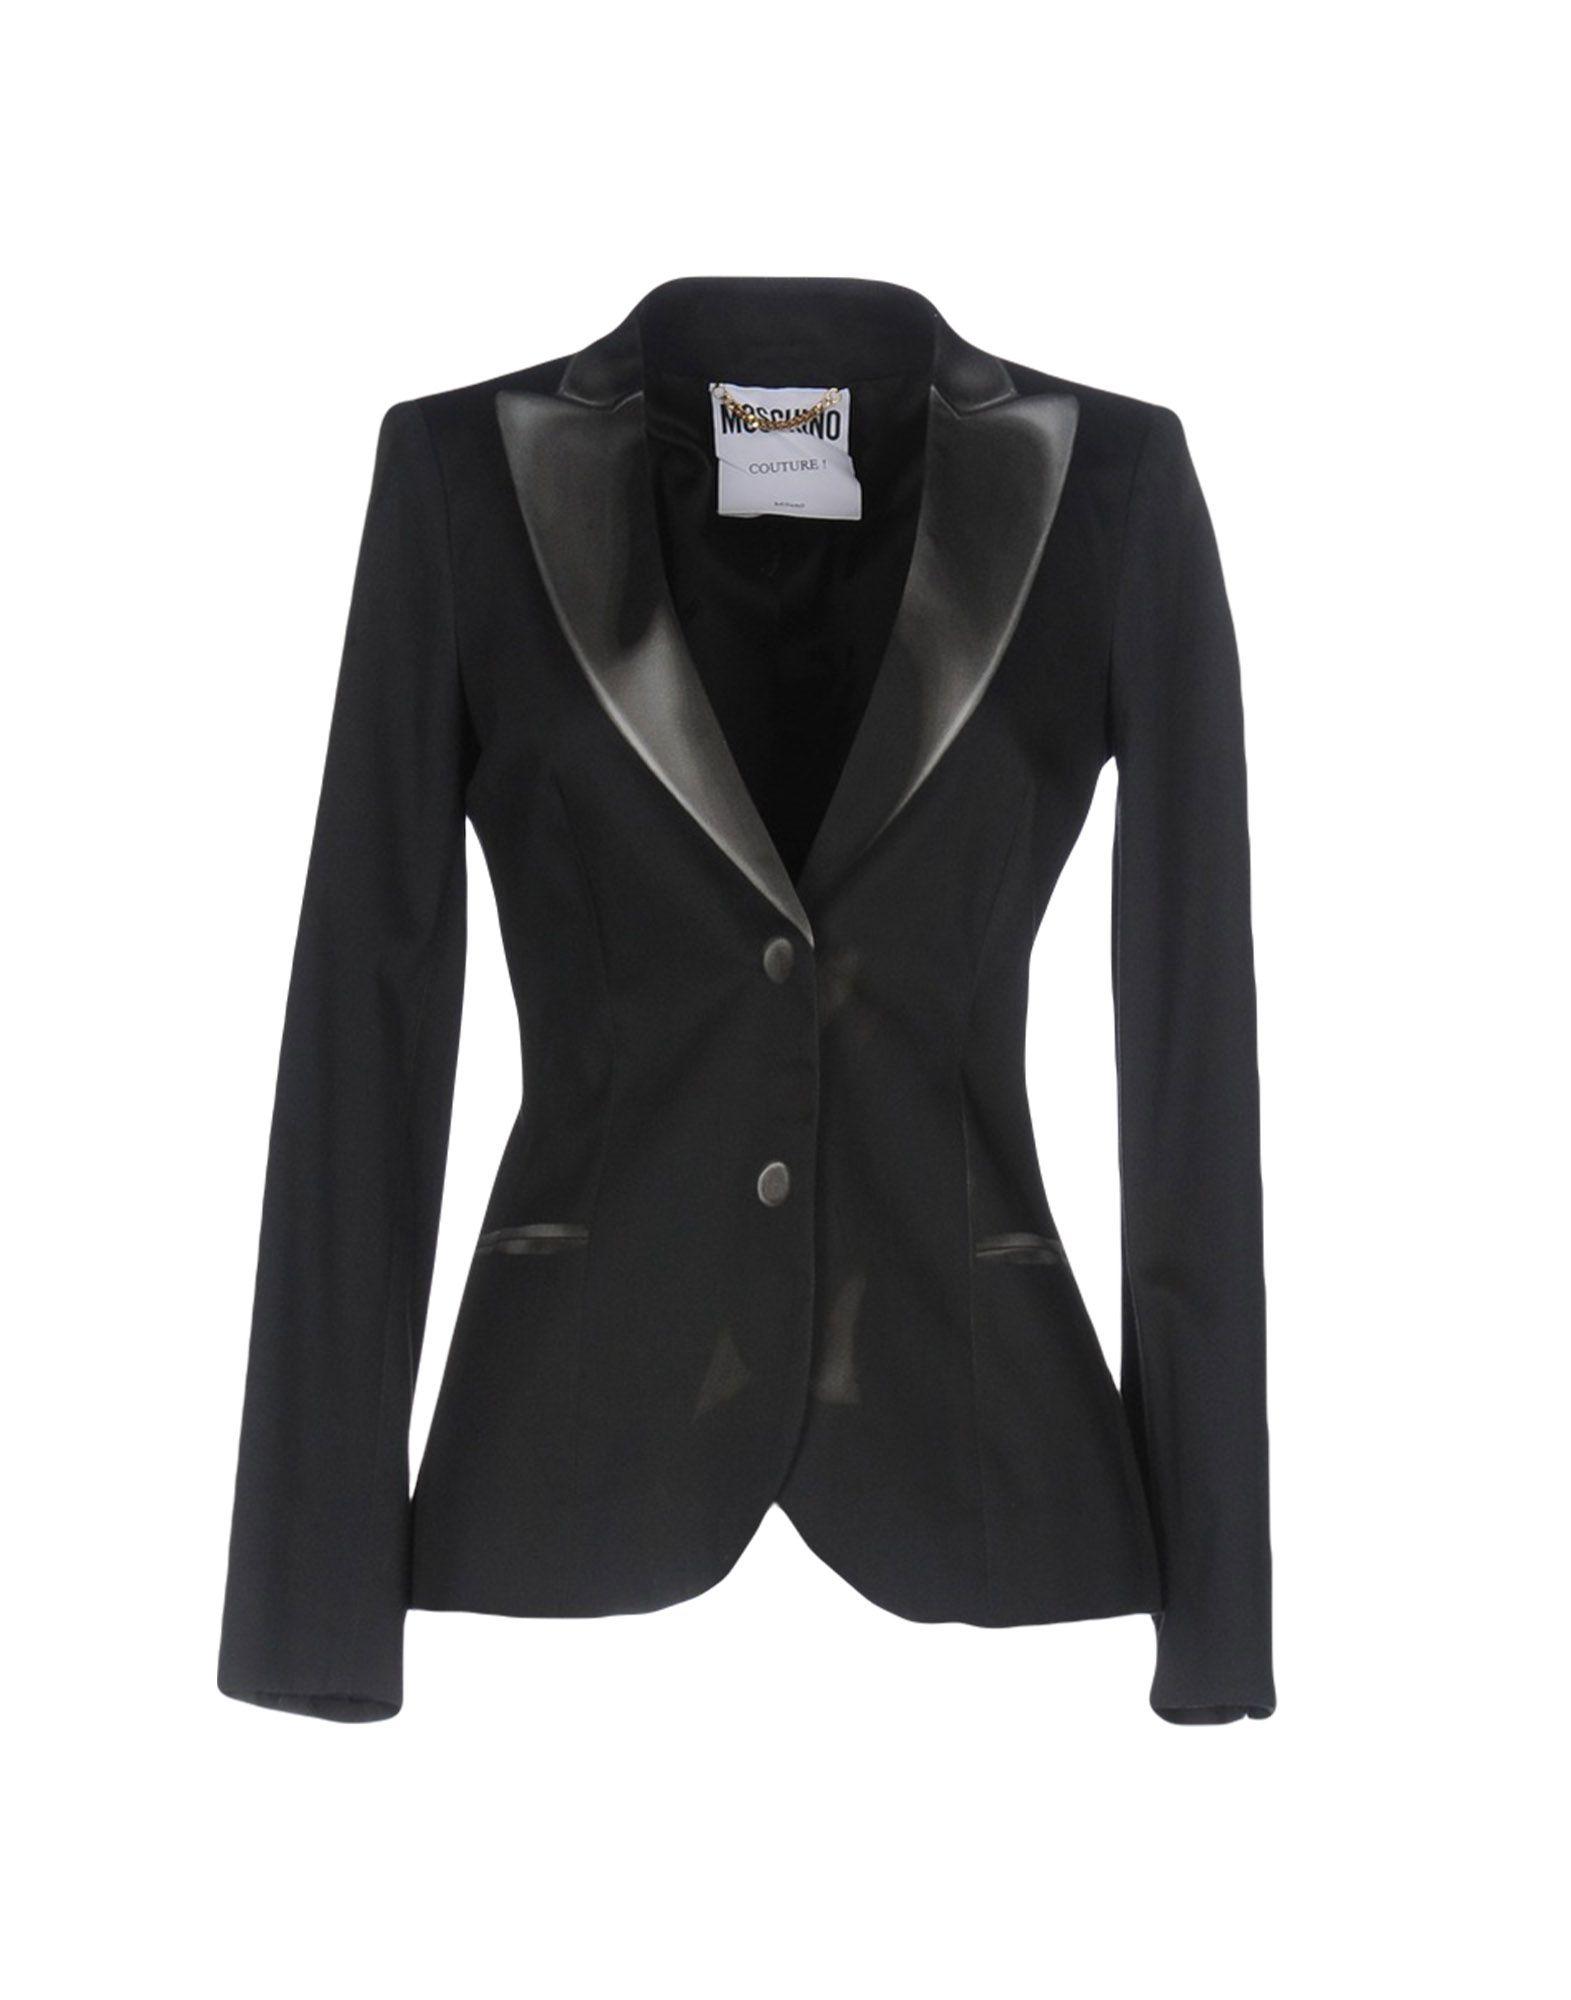 Outfit | MOSCHINO COUTURE Damen Jackett Farbe Granitgrau Größe 6